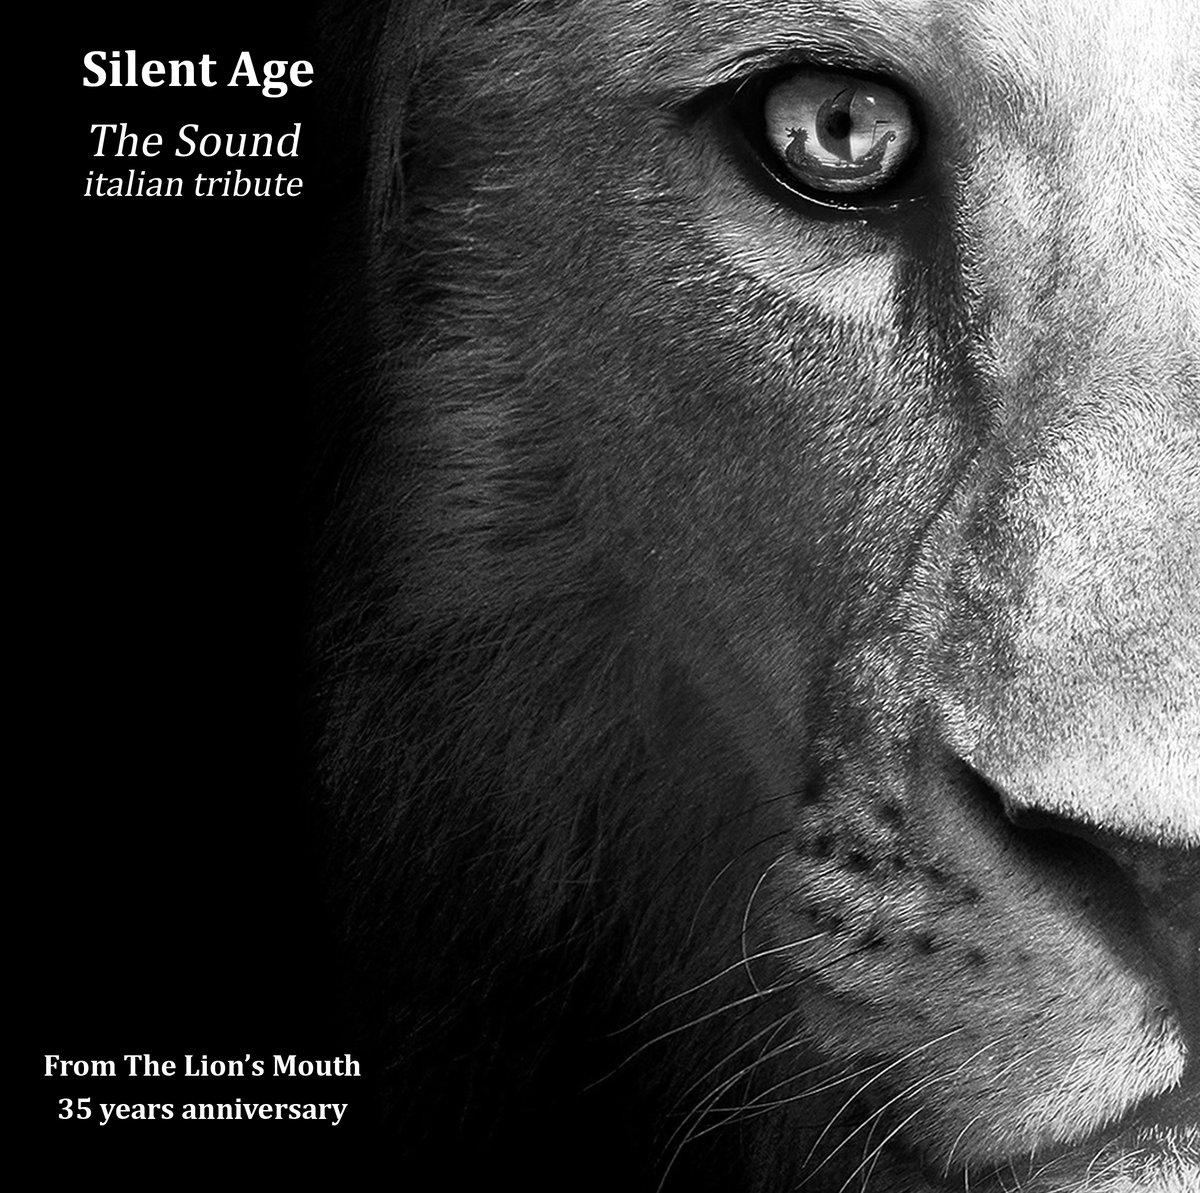 Silent Age, The Sound Italian Tribute